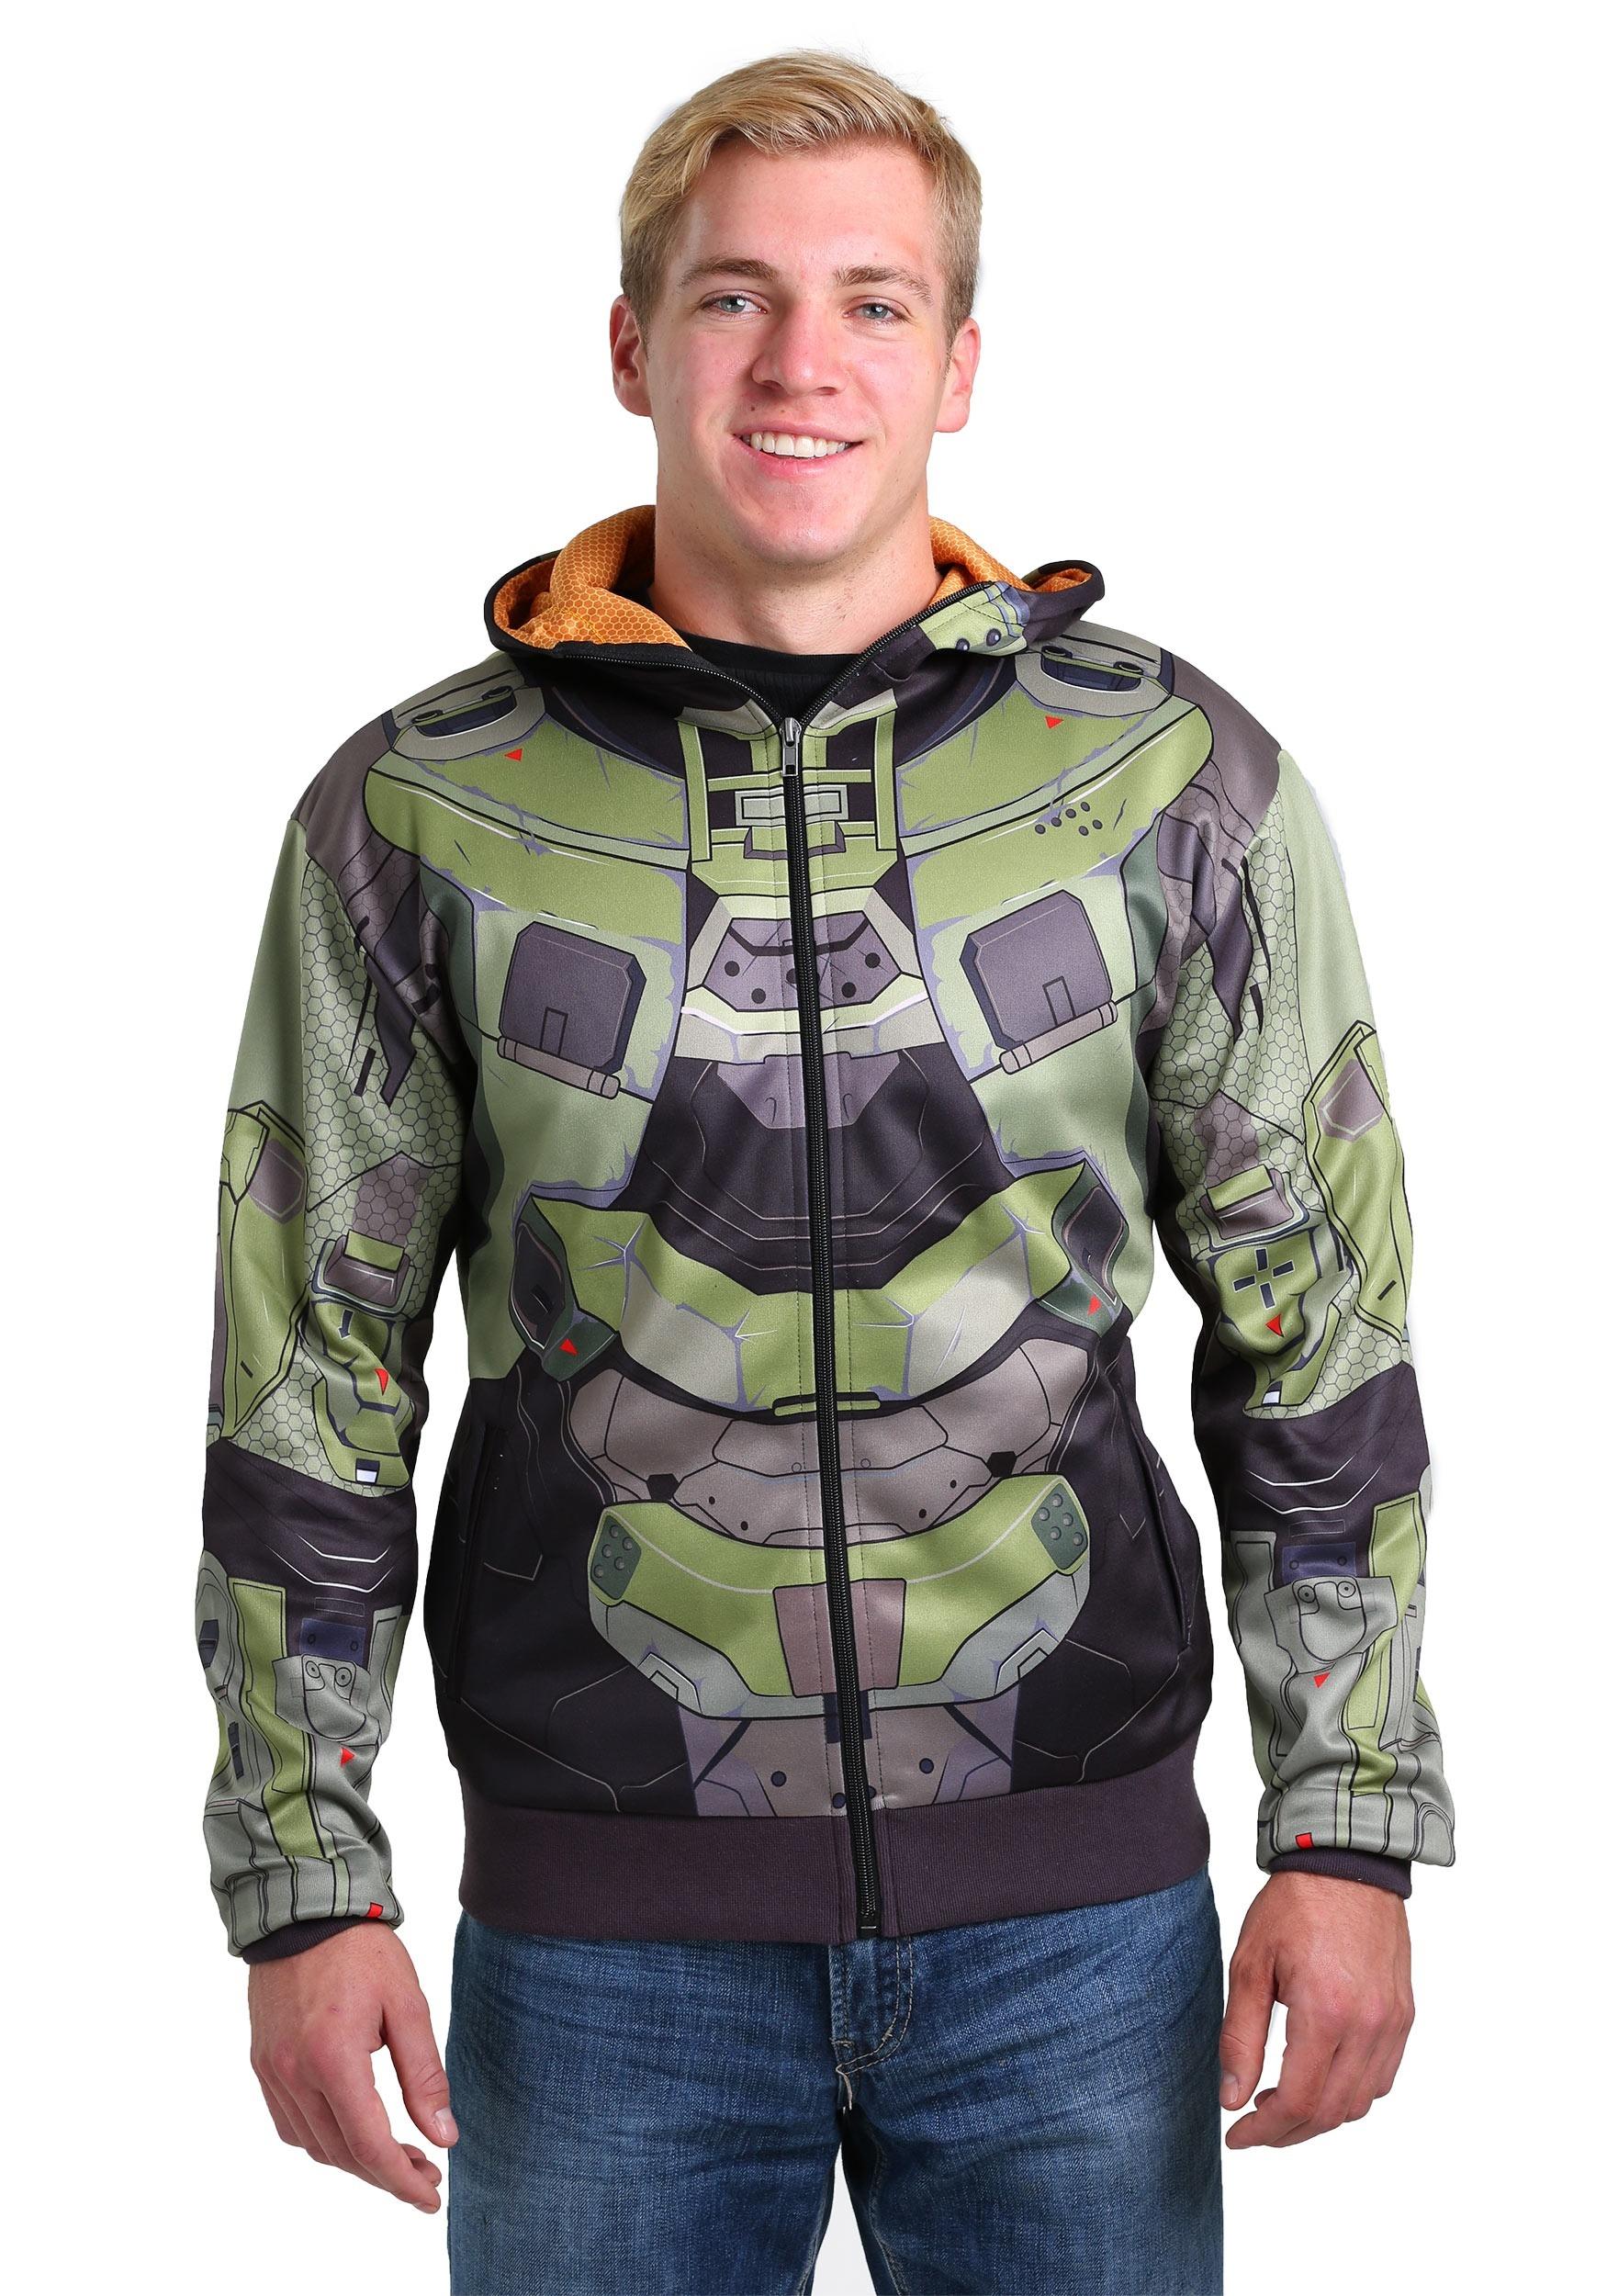 Halo Christmas Sweater.Adult Halo Master Chief Costume Hoodie